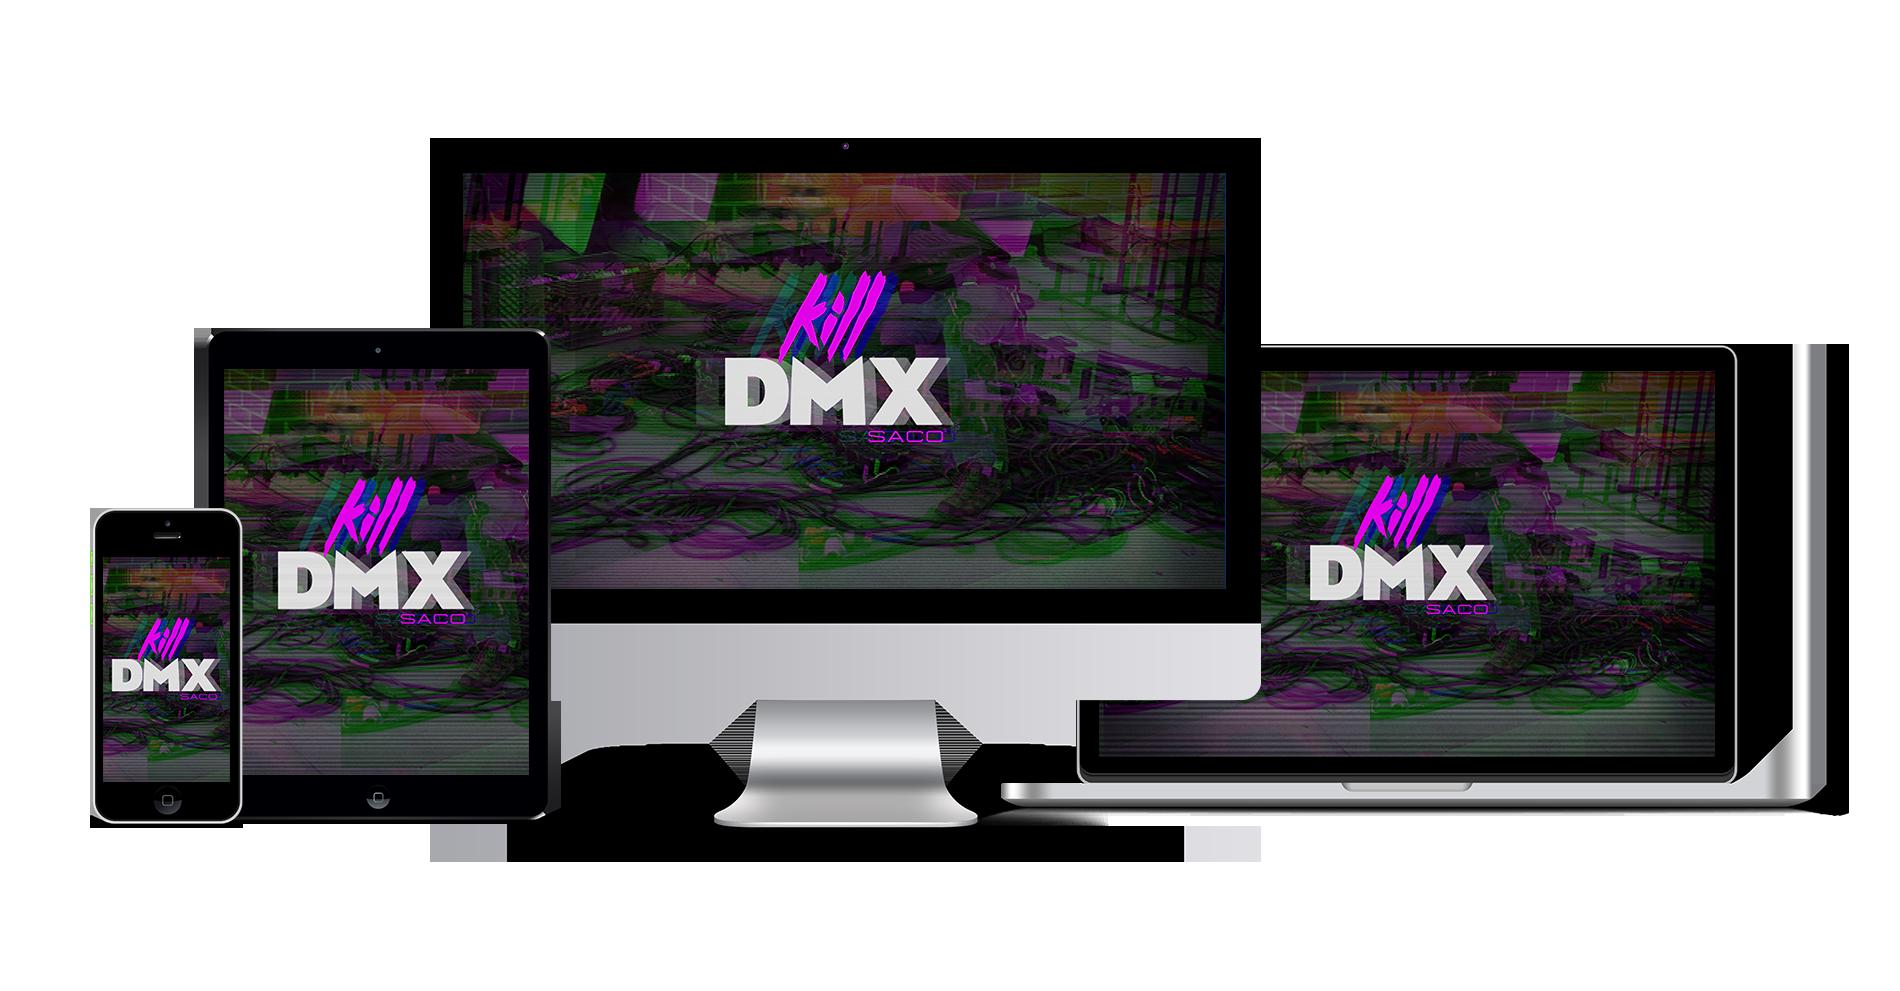 Kill DMX Wallpaper SACO Technologies Inc 1900x991